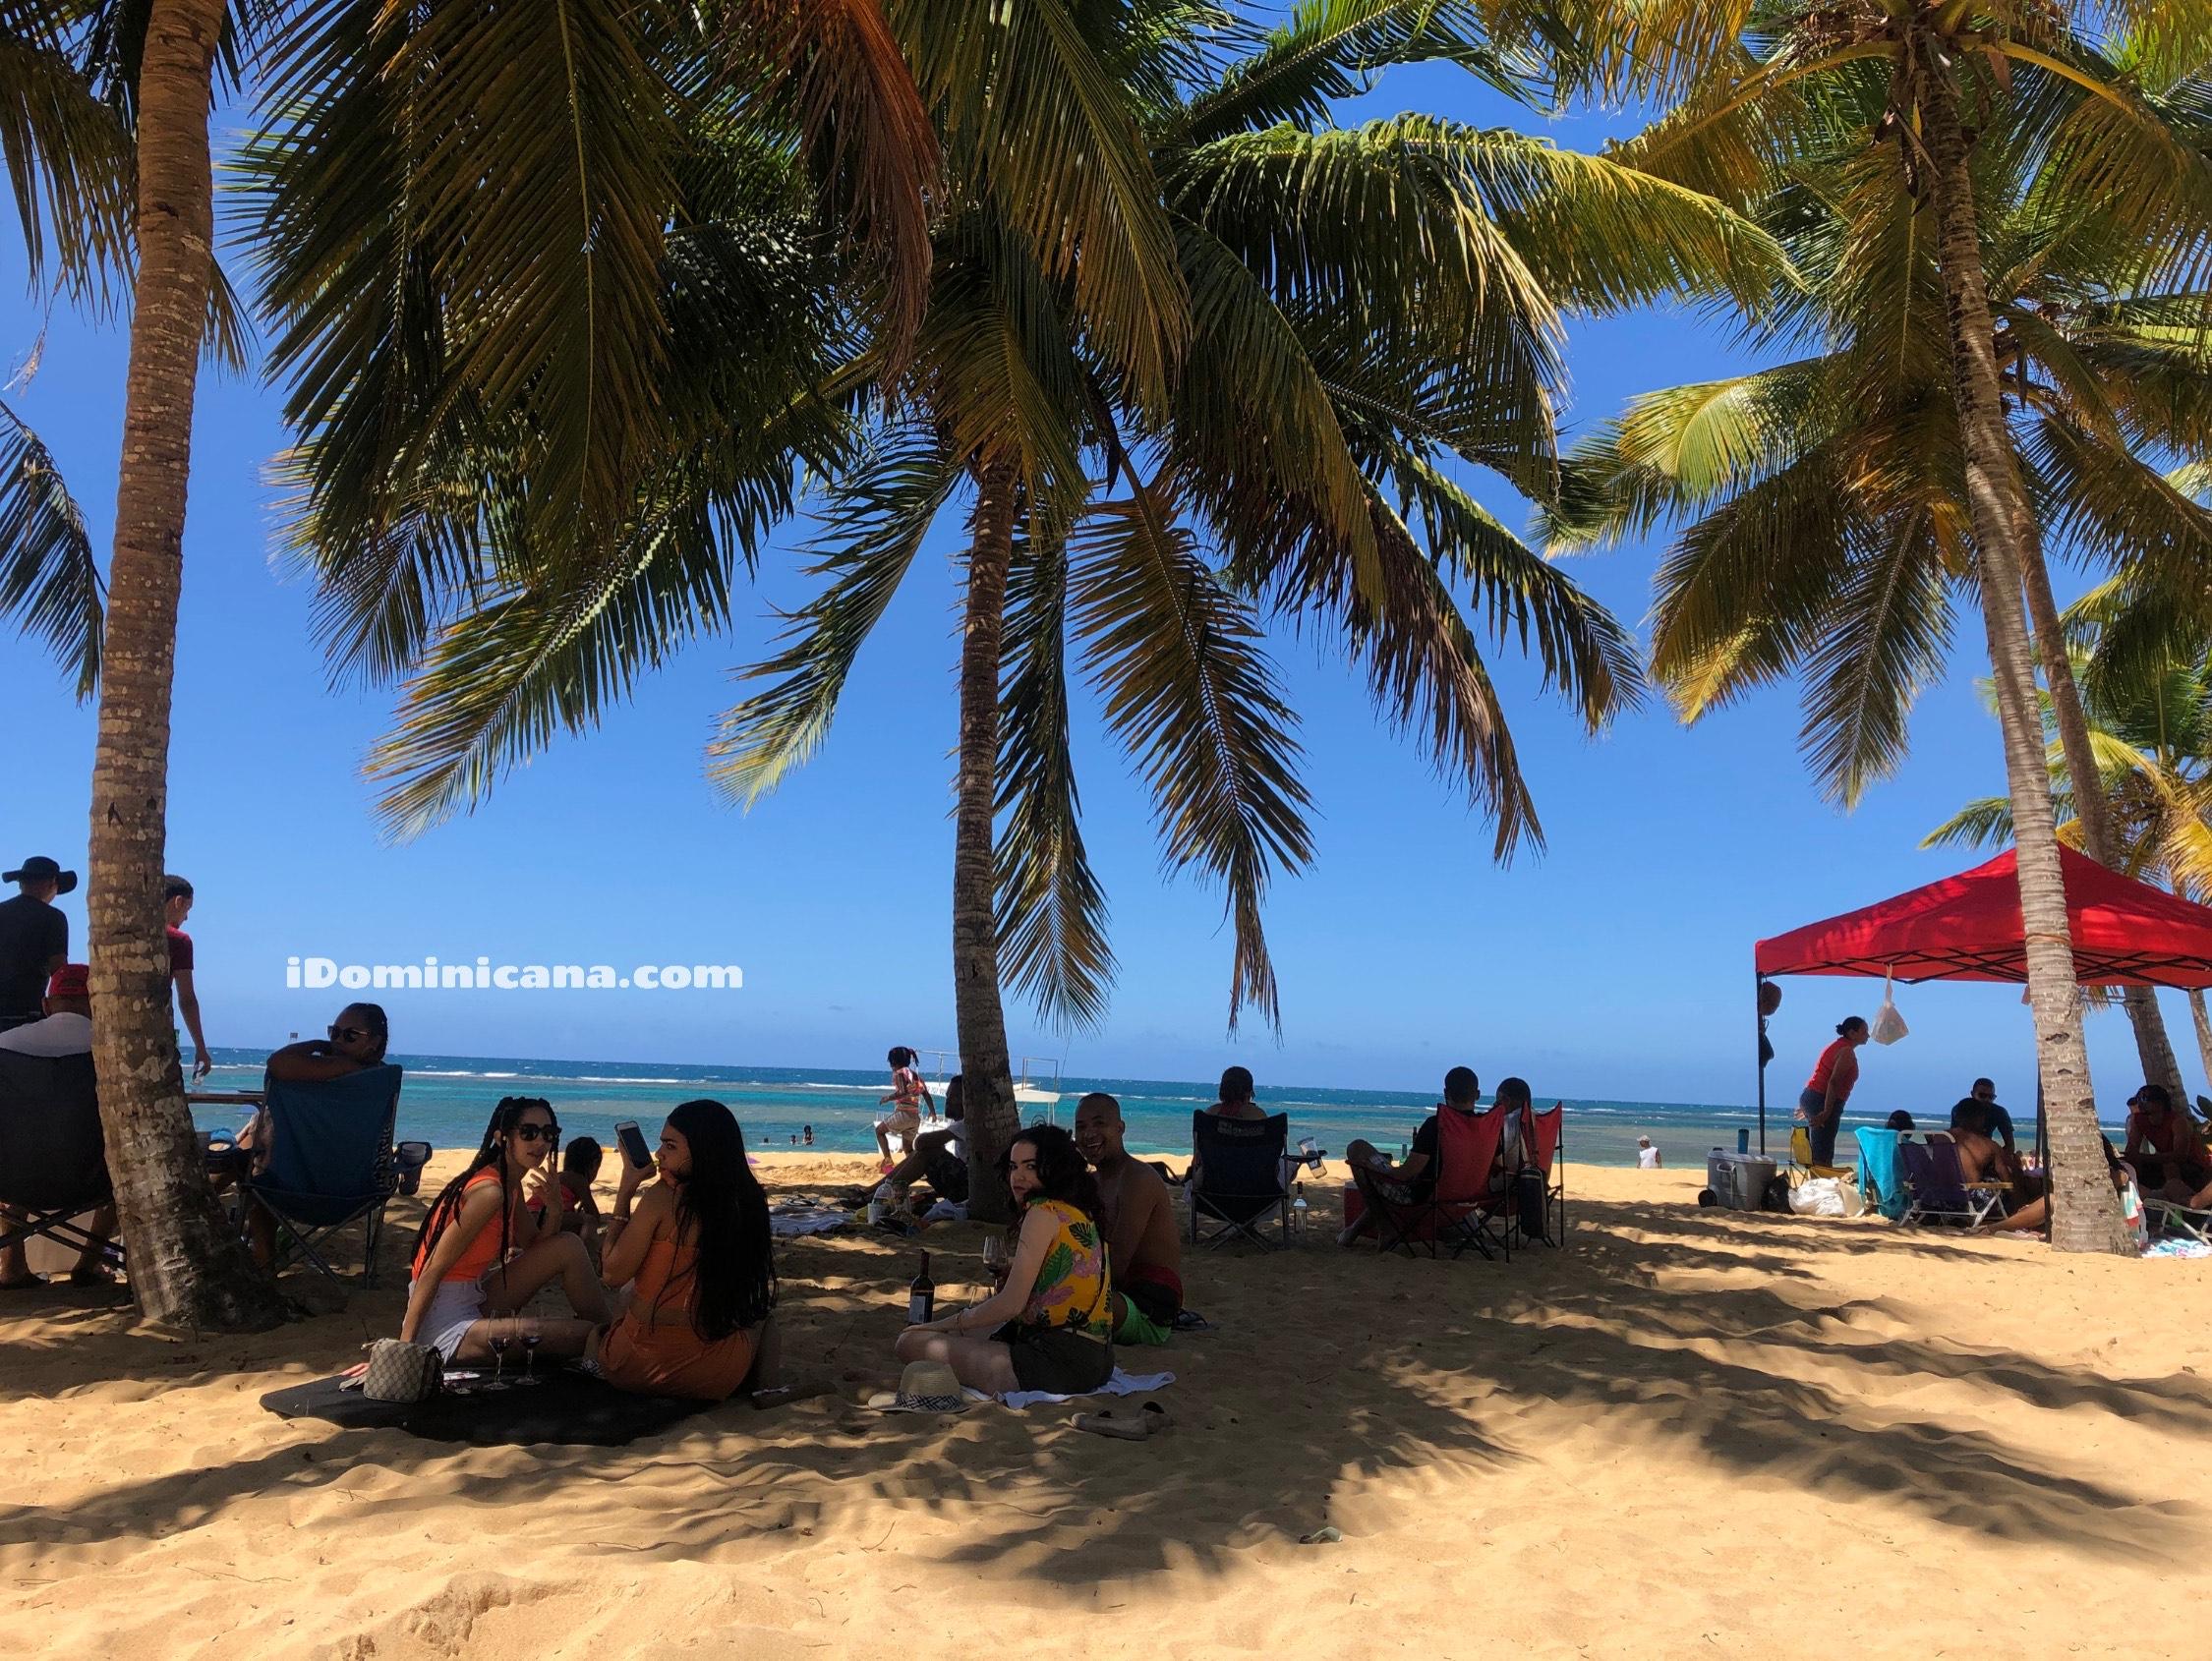 Семана Санта в Доминикане 2021: Католическая Пасха